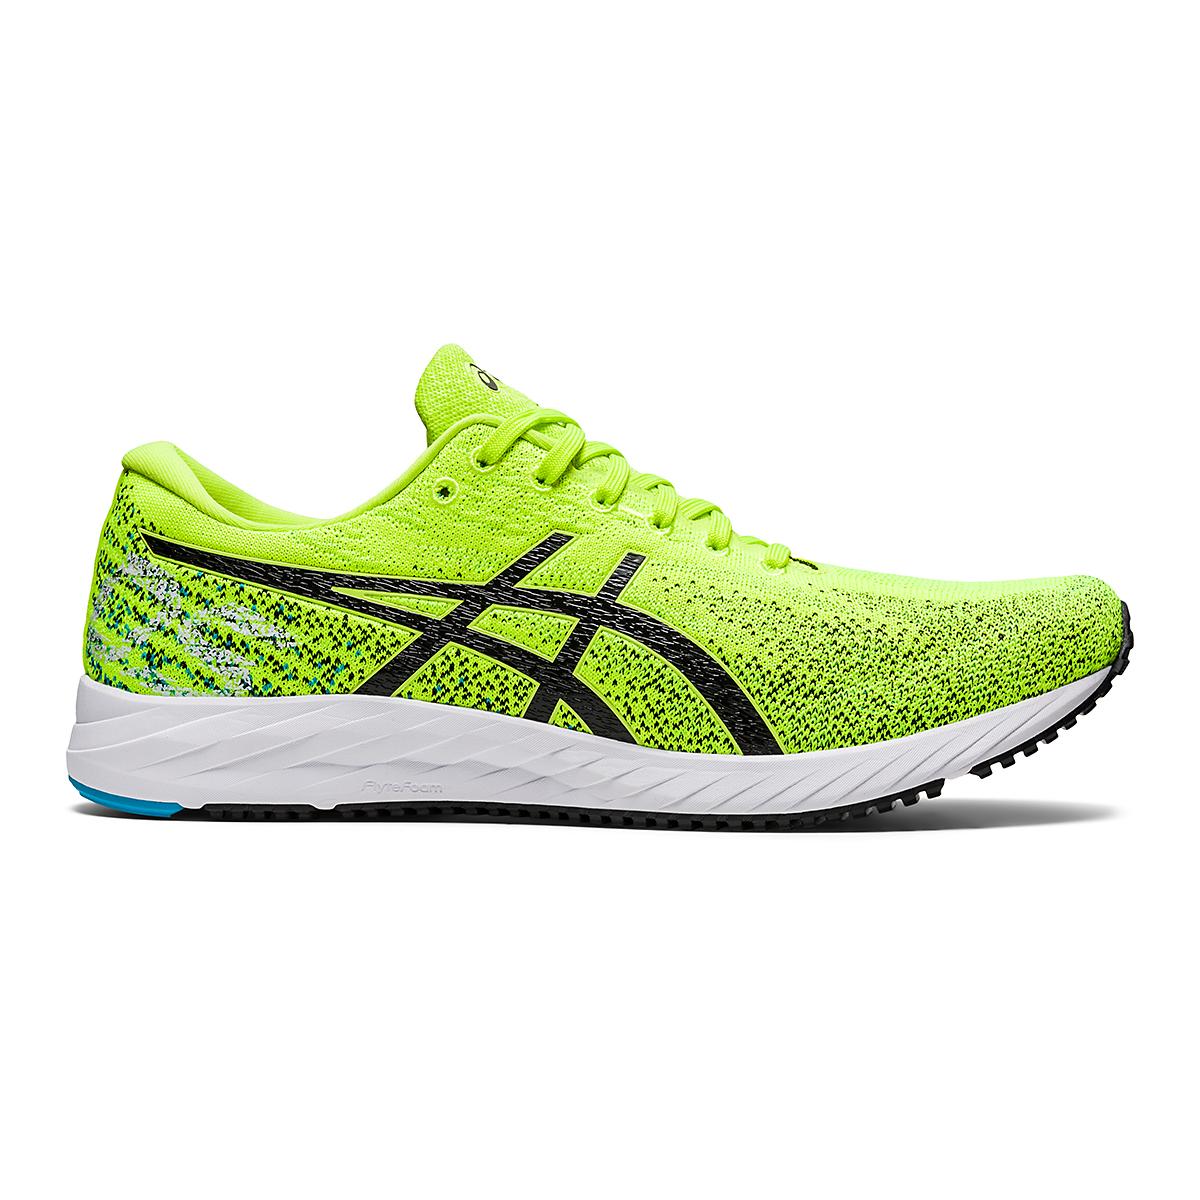 Men's Asics Gel-DS Trainer 26 Running Shoe - Color: Hazard Green/Black - Size: 6 - Width: Regular, Hazard Green/Black, large, image 1